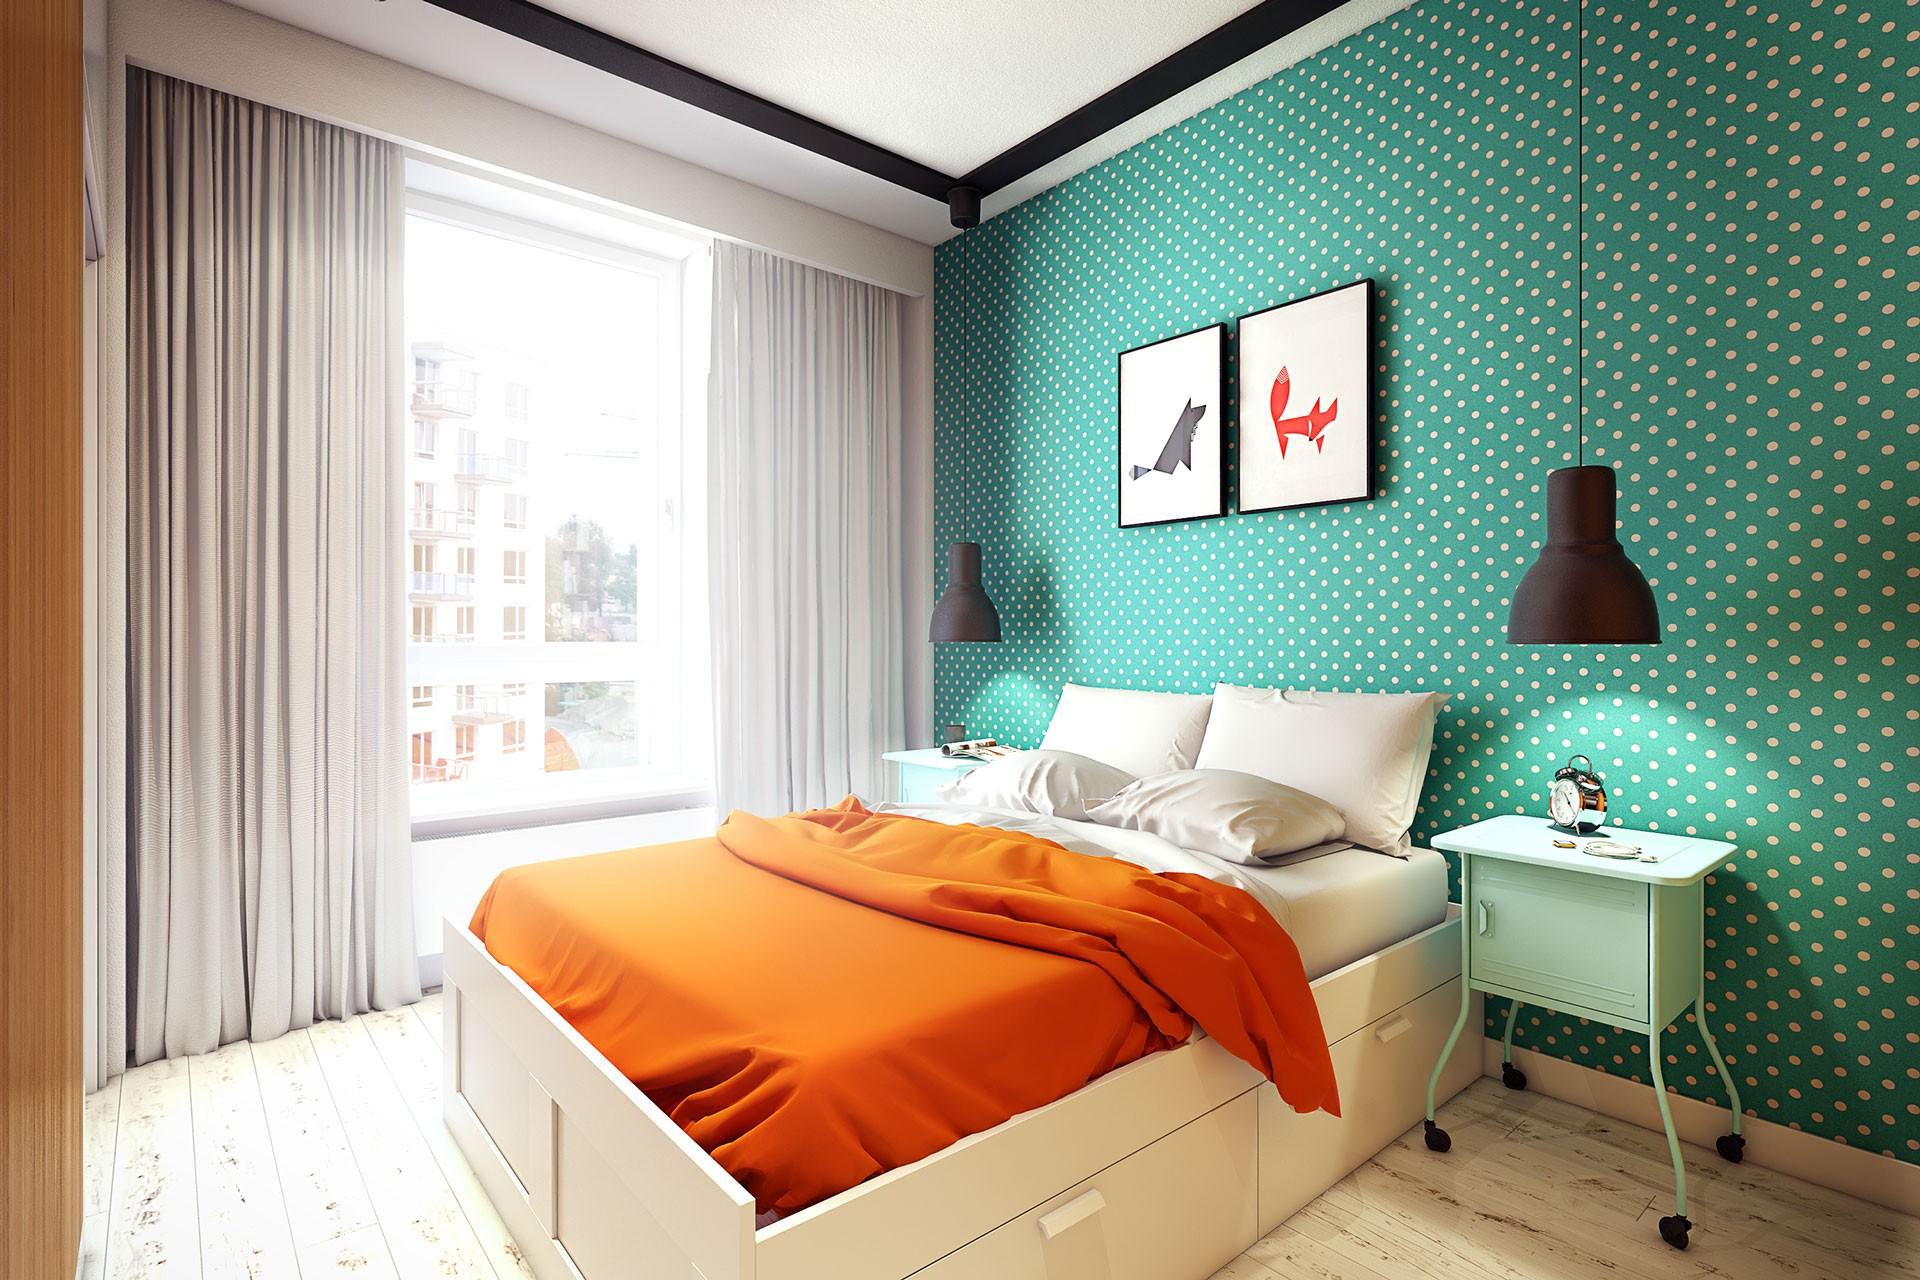 спальня дизайн фото 9 кв м